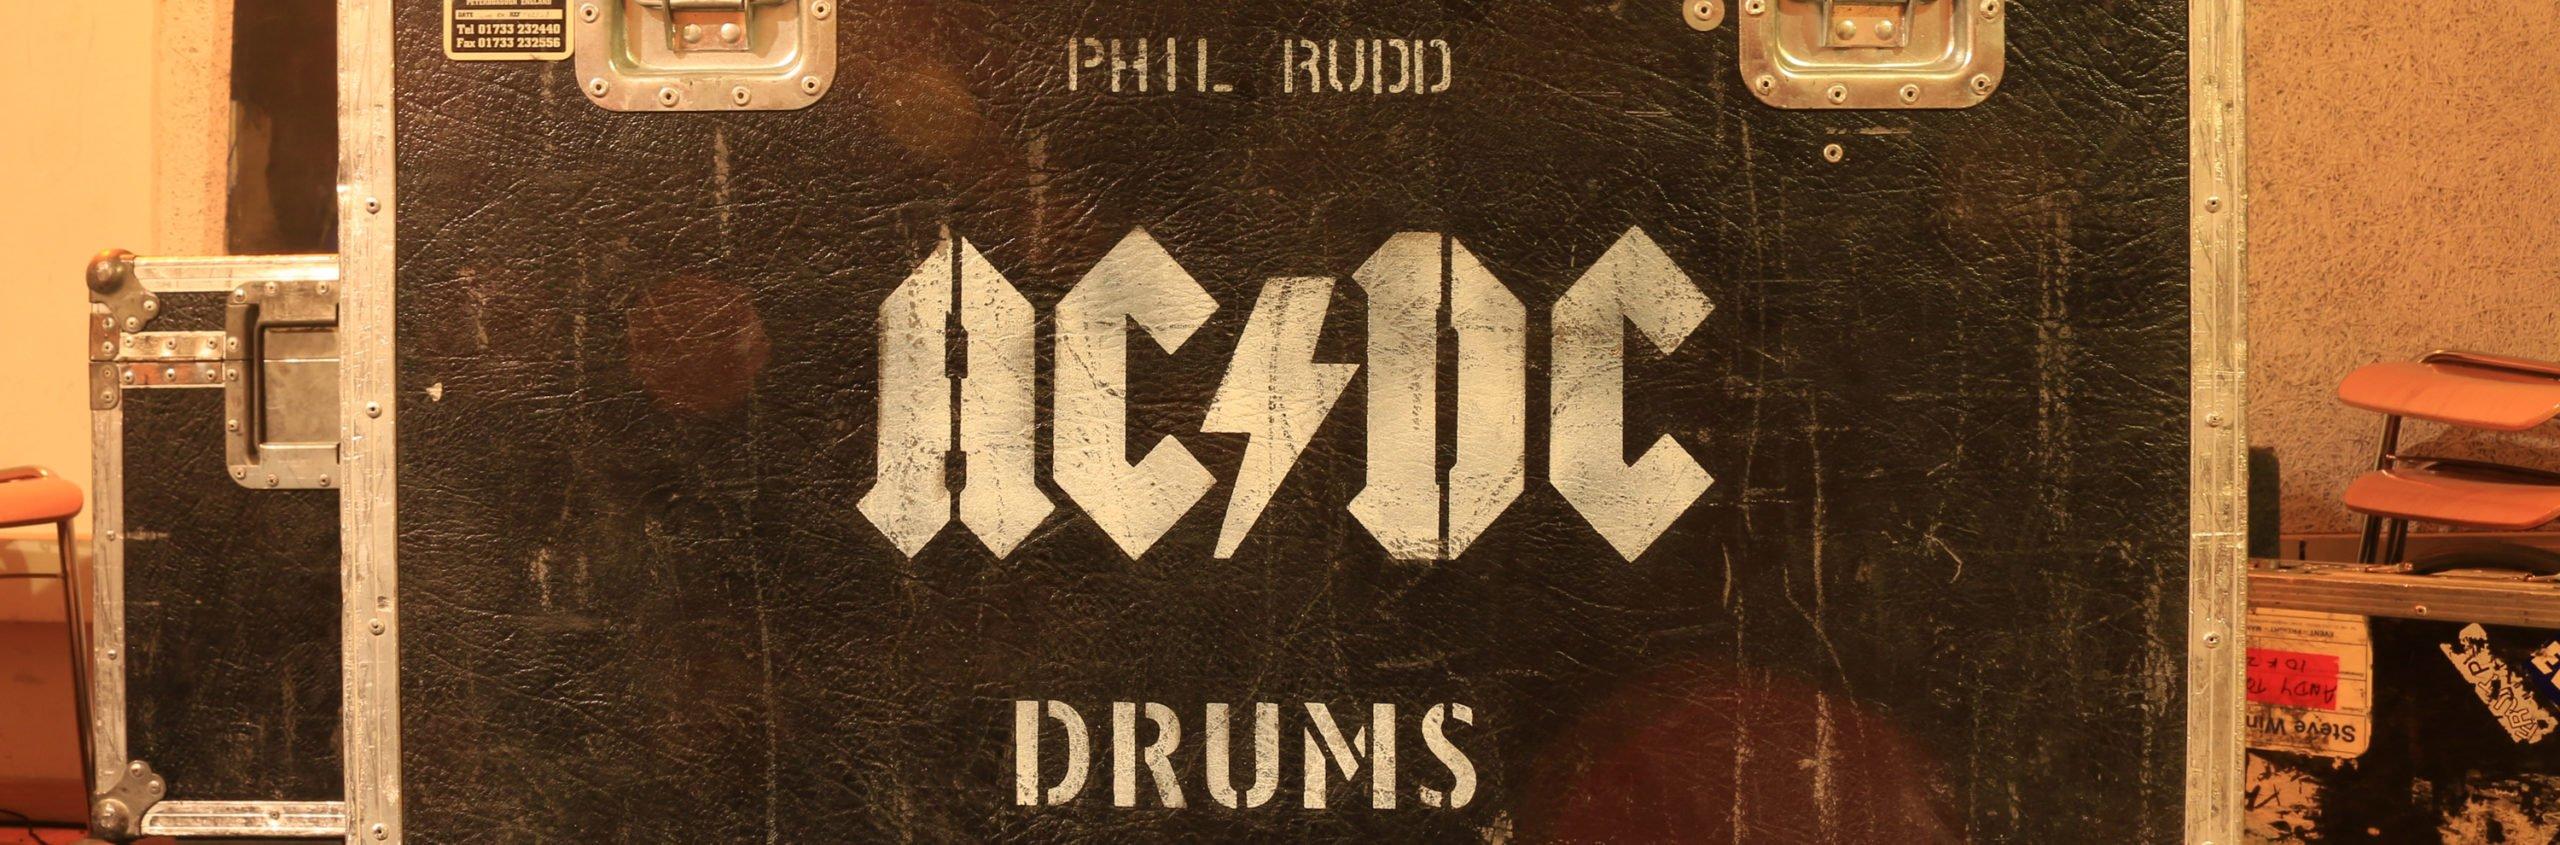 Phil Rudds Drumset im t-on